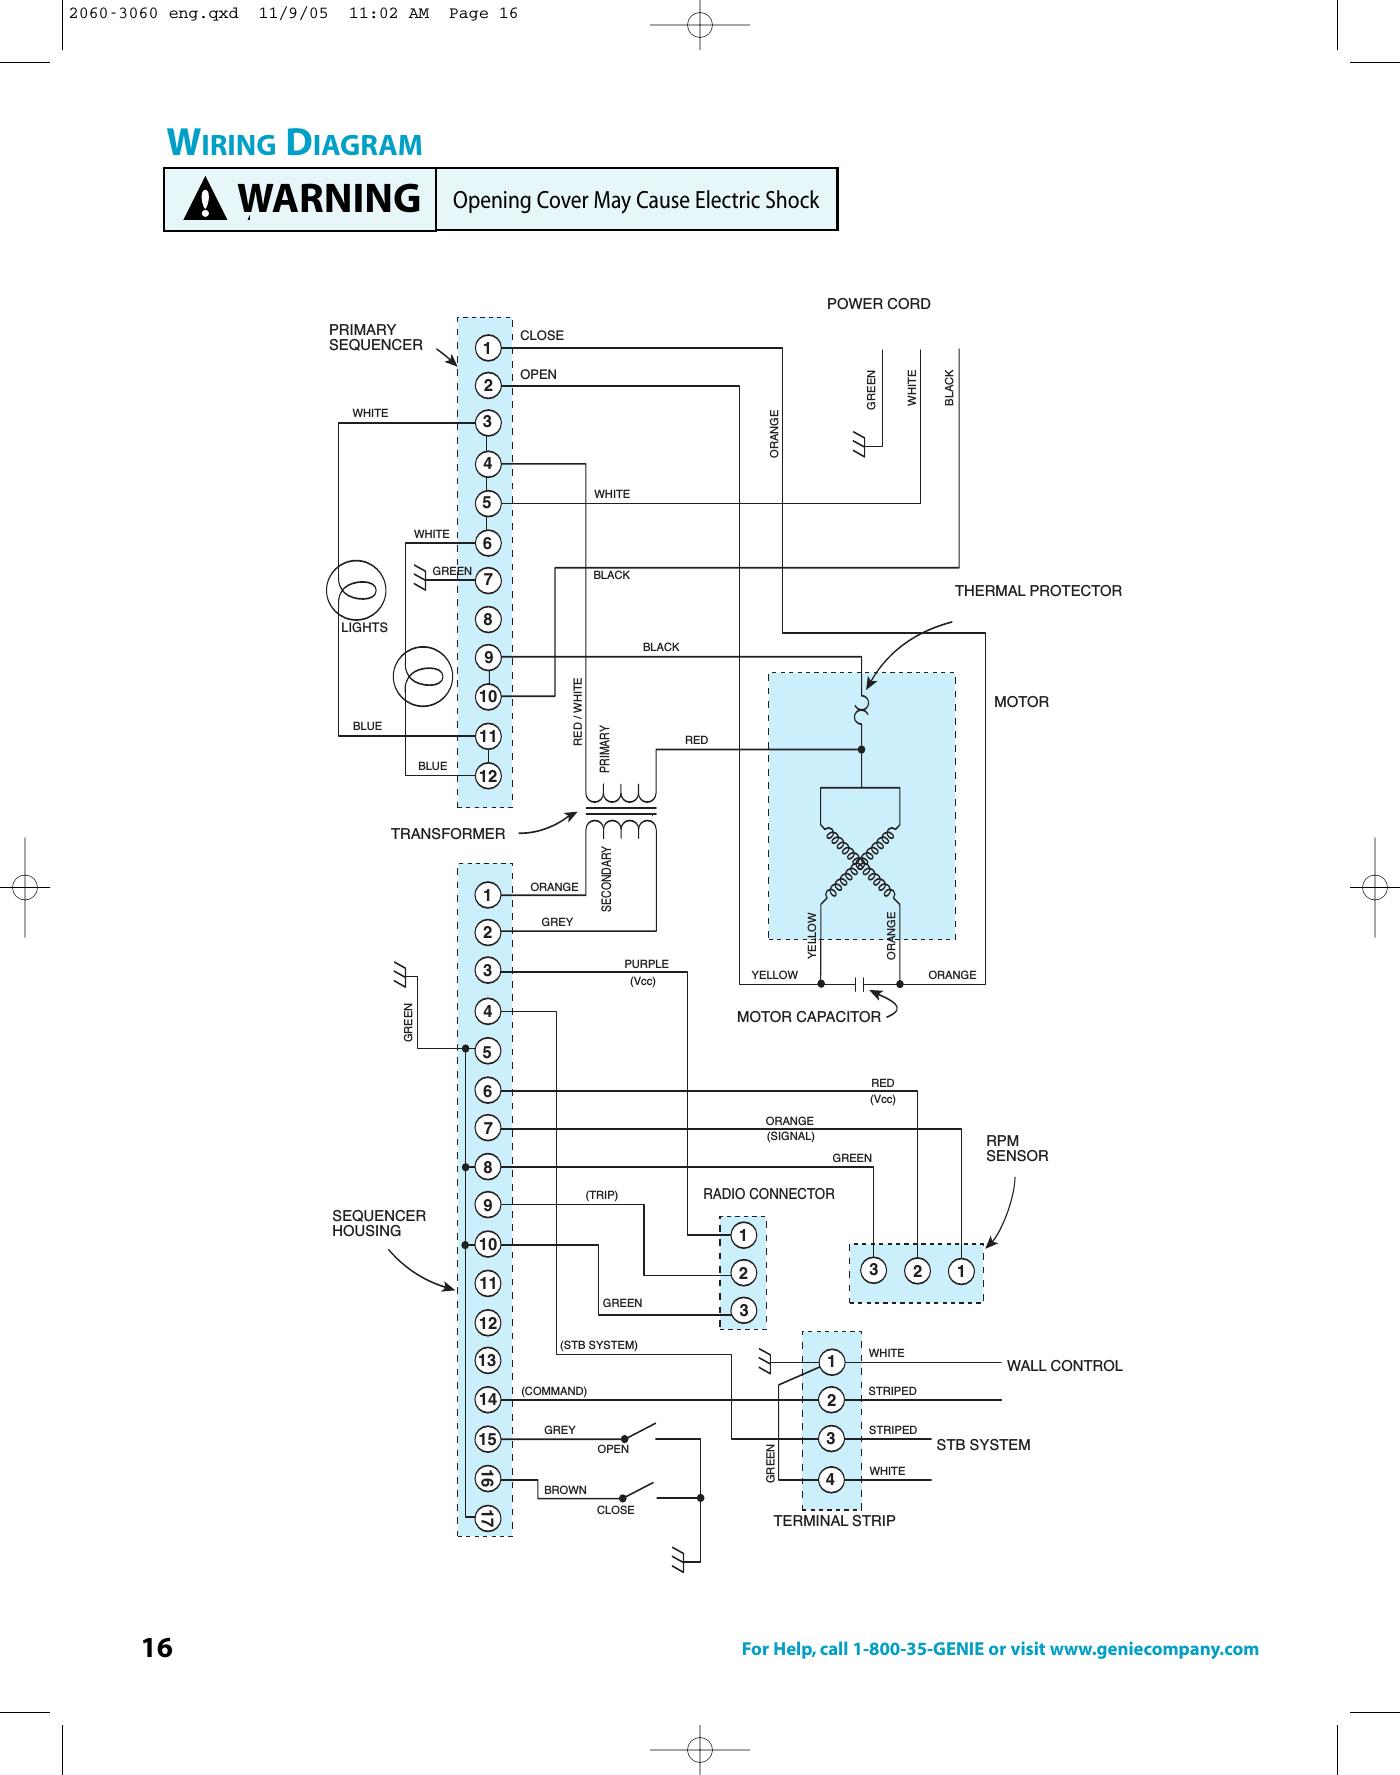 Intellicode Genie Garage Door Opener Wiring Diagram from static-cdn.imageservice.cloud